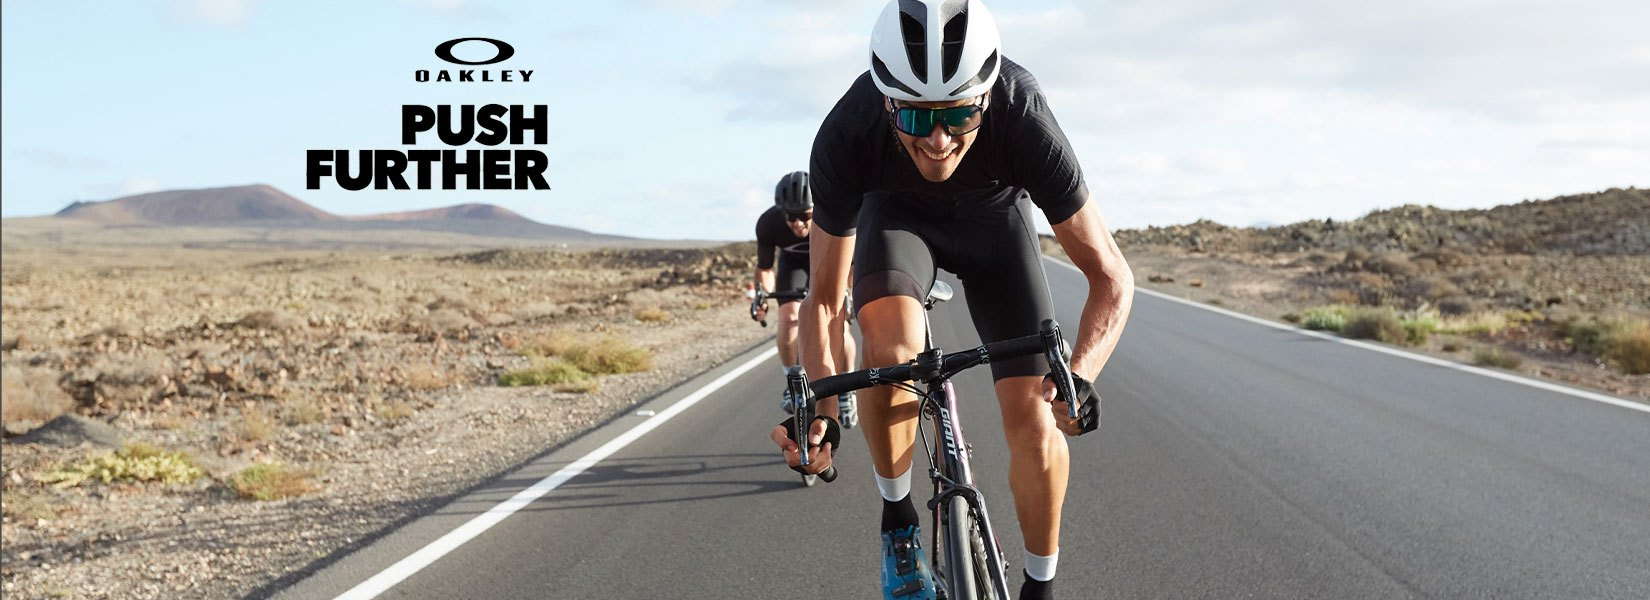 OakleyCycling